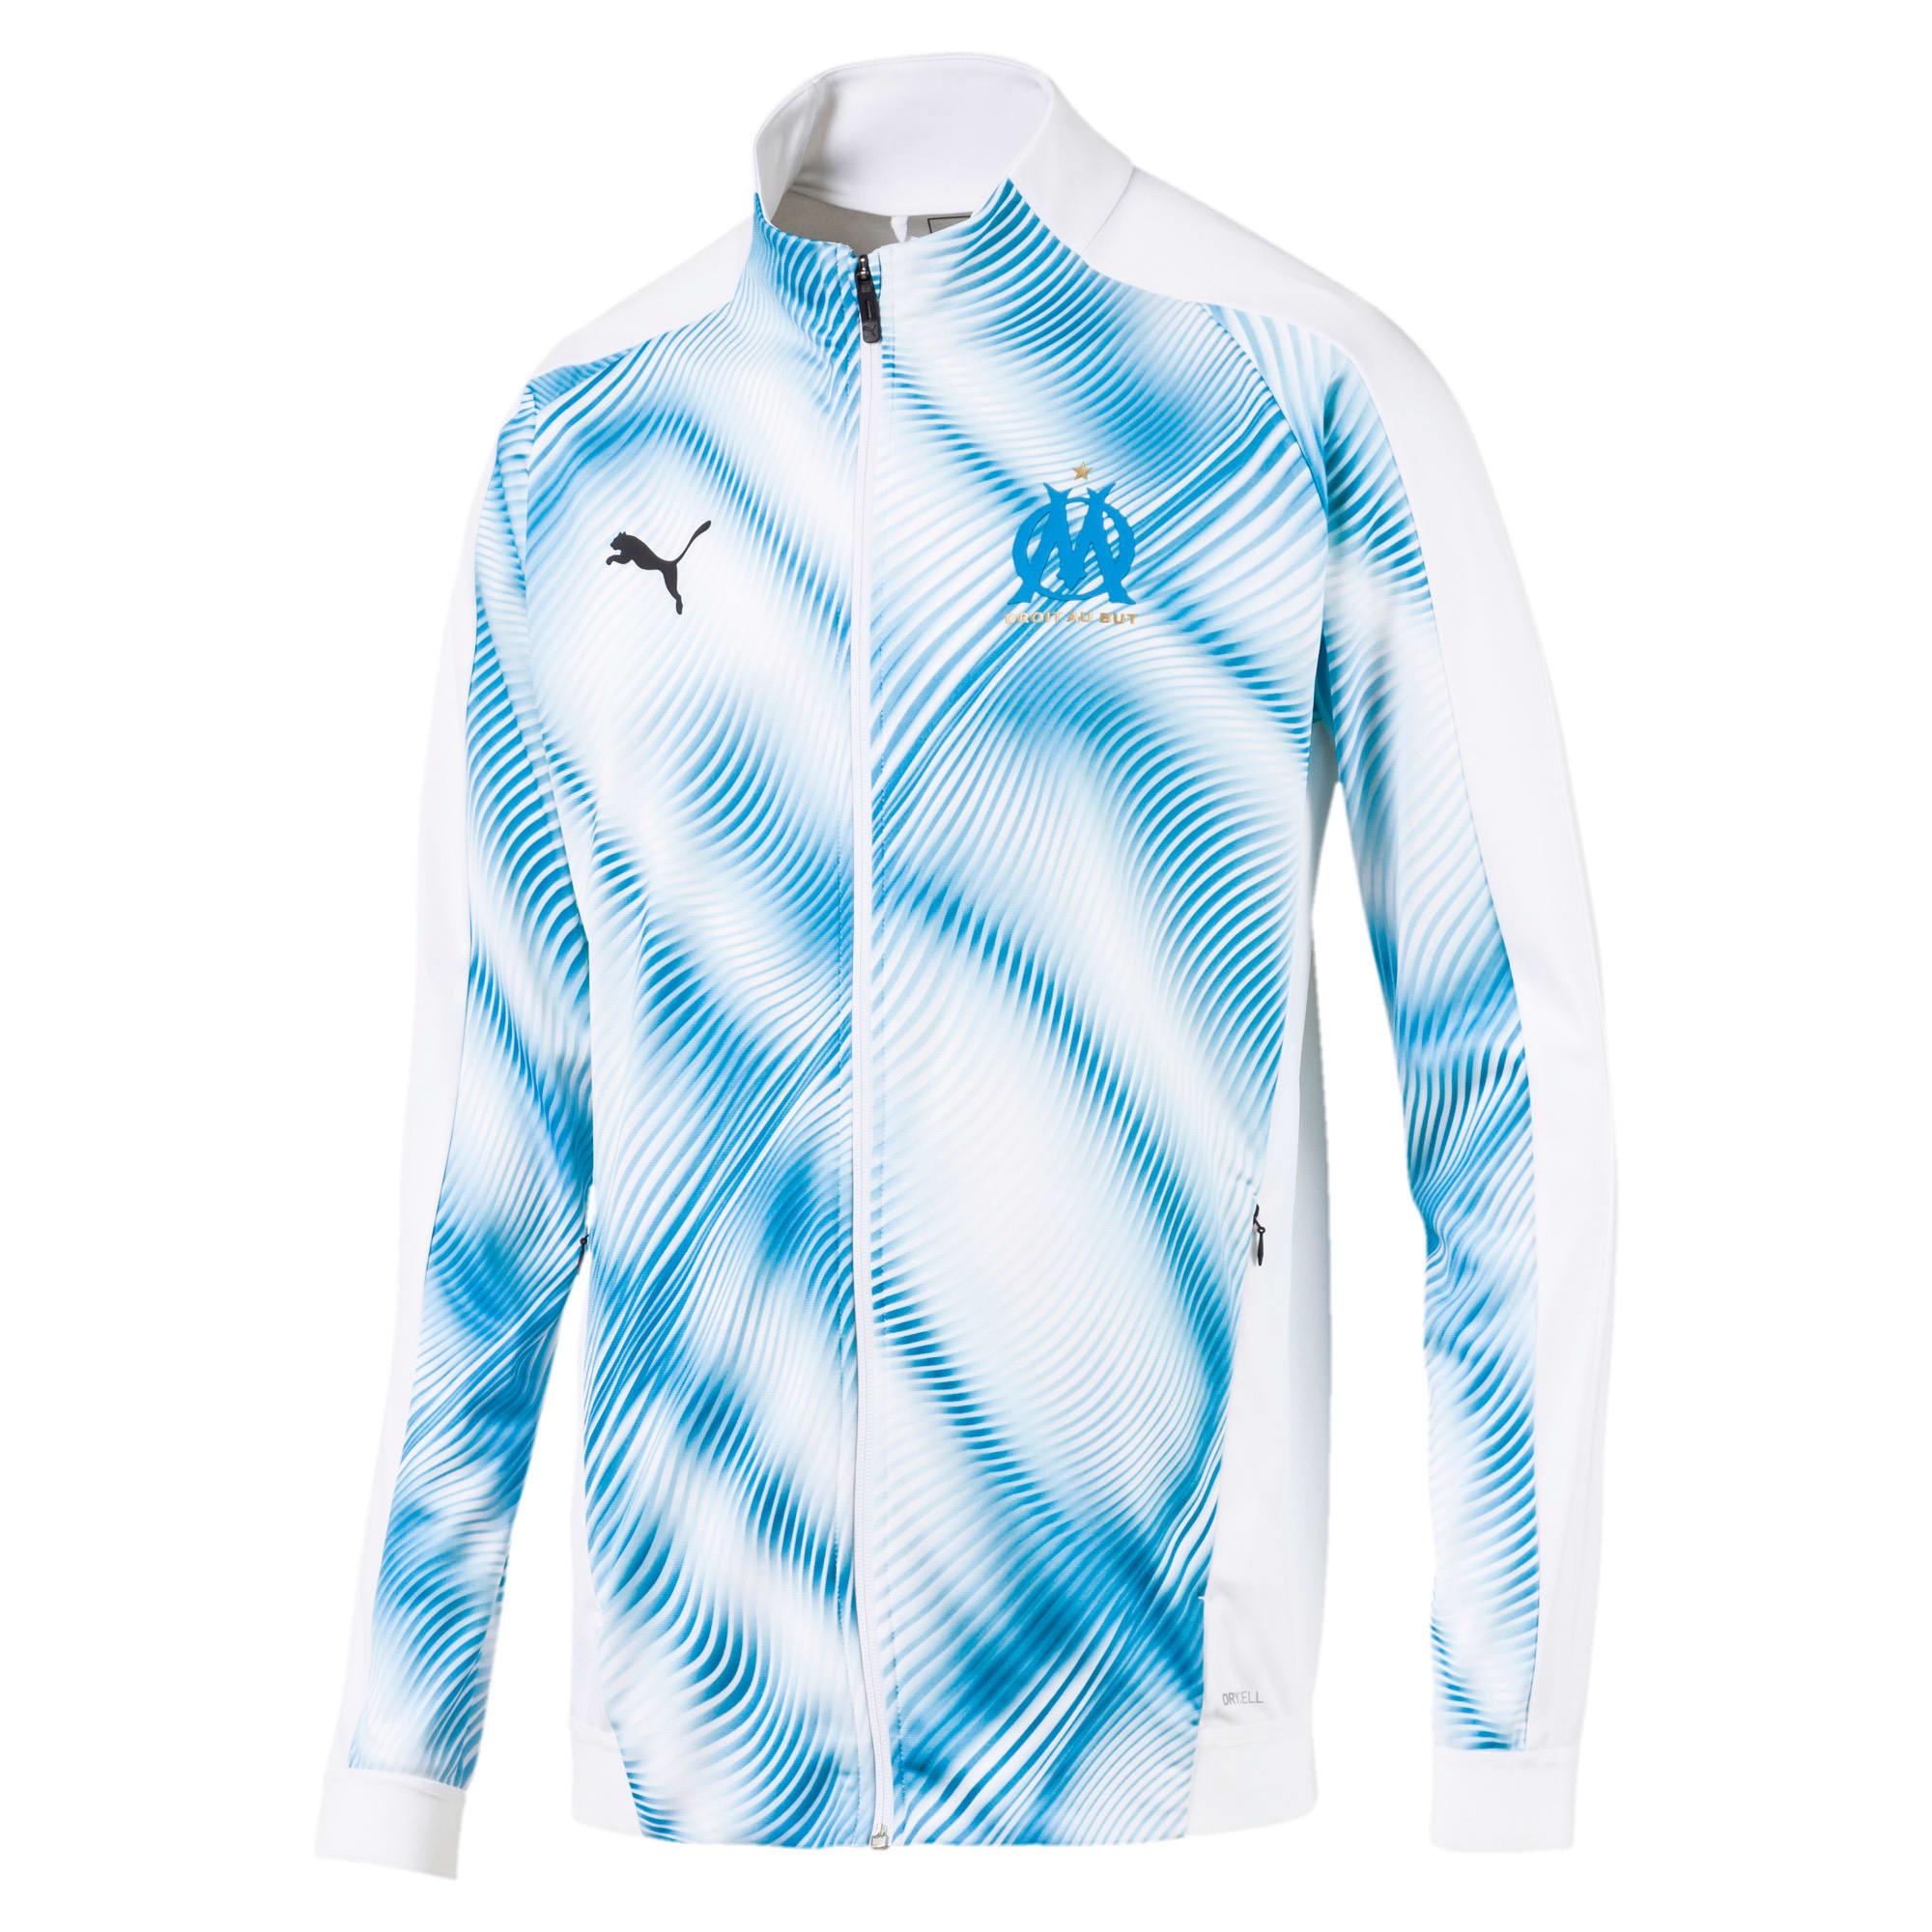 Thumbnail 1 of Olympique de Marseille Men's Stadium Jacket, Puma White-Bleu Azur, medium